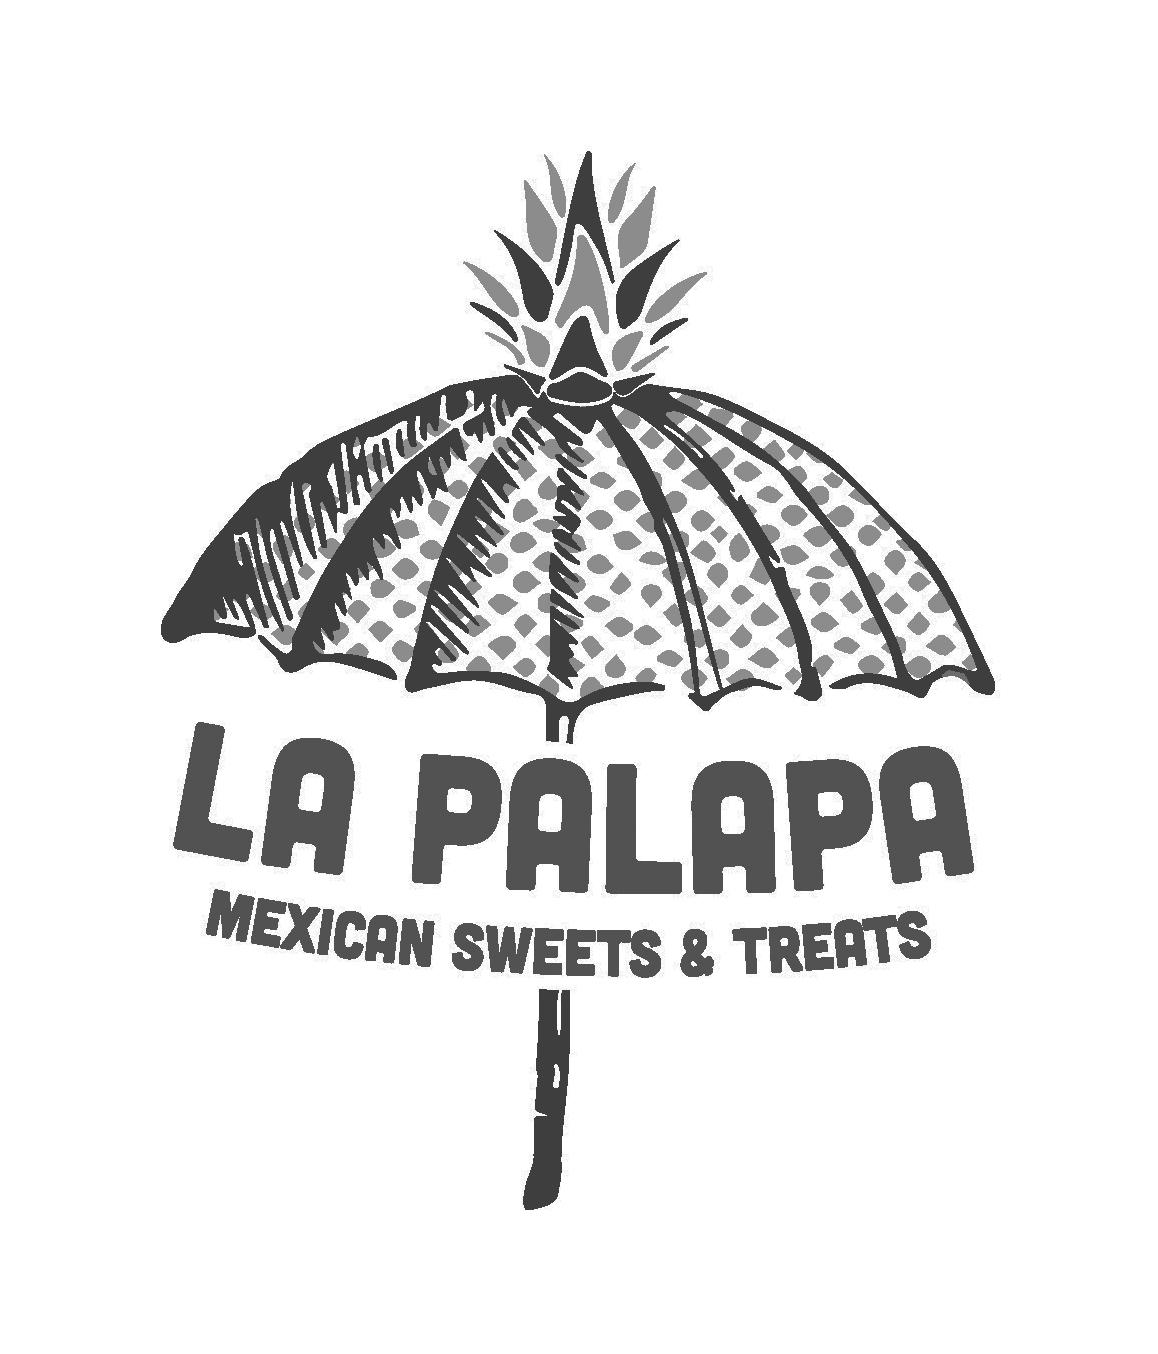 LaPalapaLogoColor1.jpg